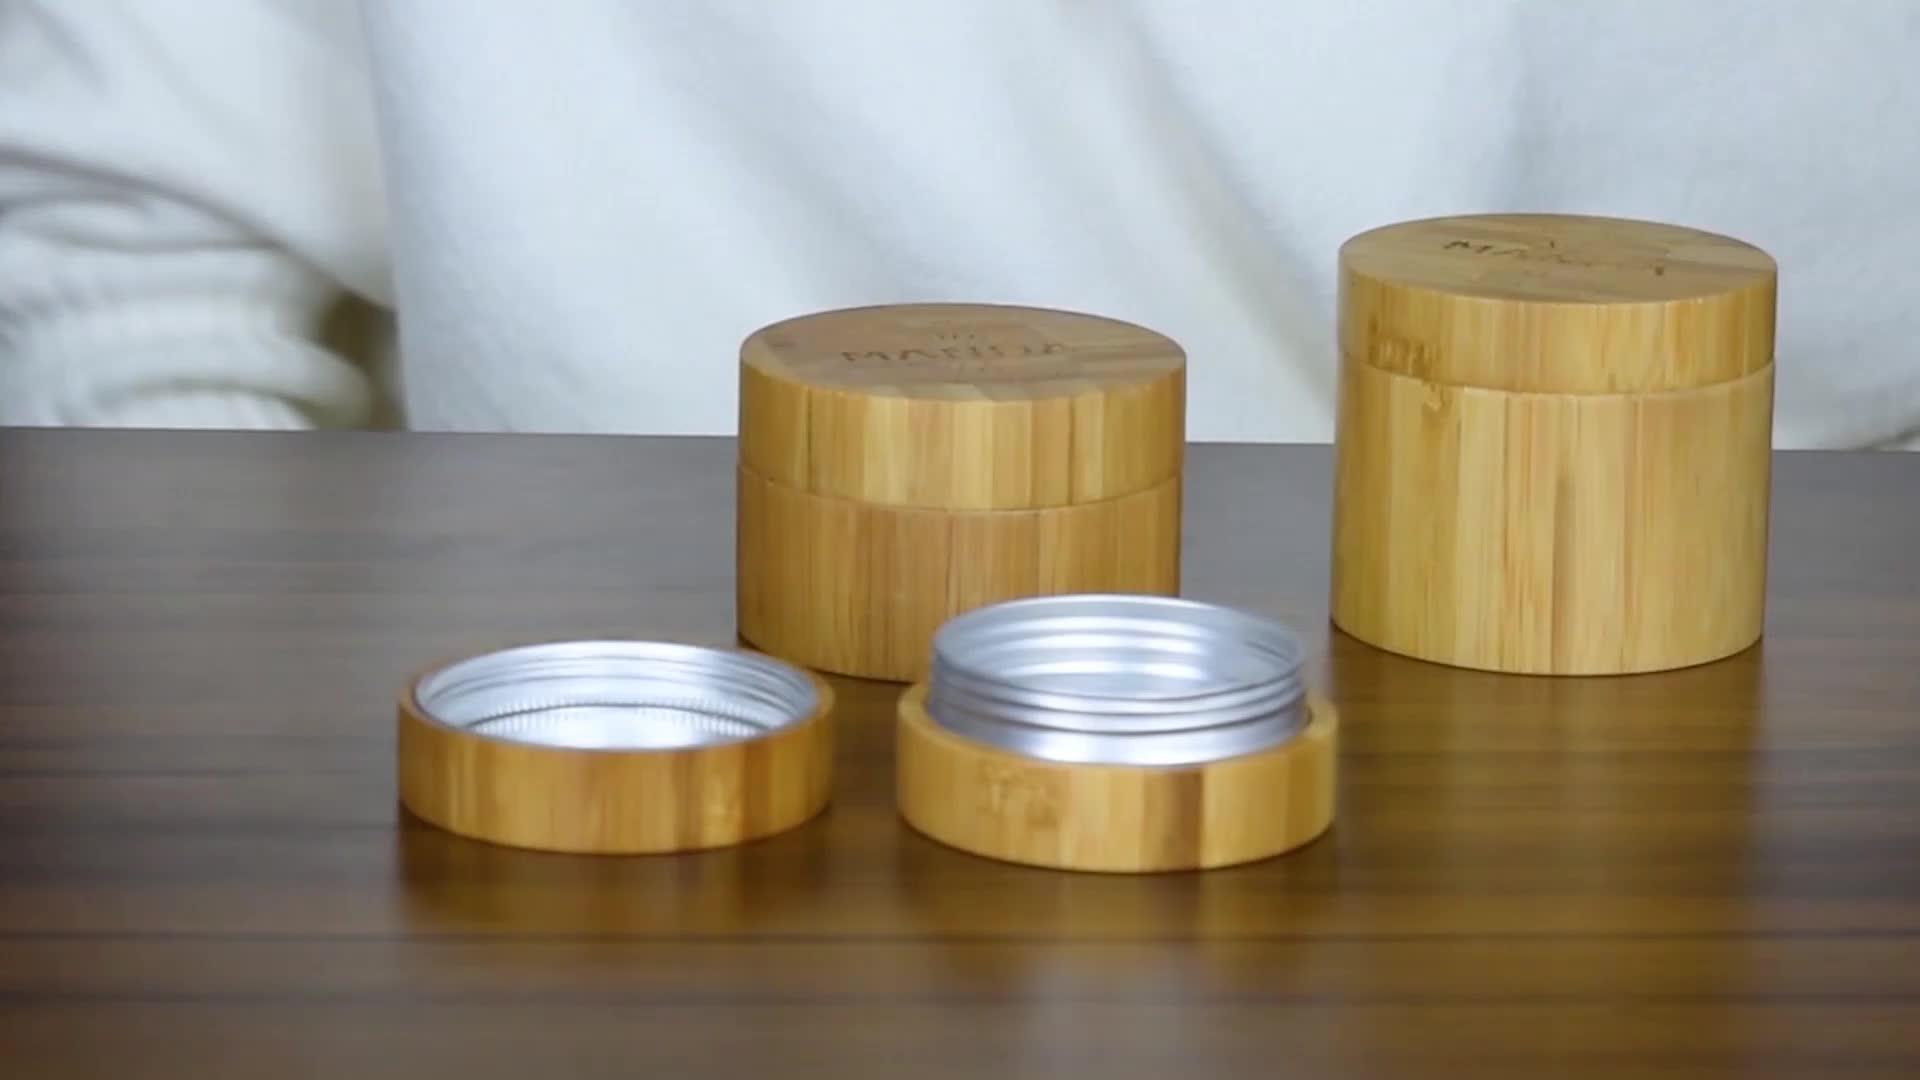 Embalagem cosmética de bambu 30g jarro de bambu de bambu frasco de bambu bálsamo labial